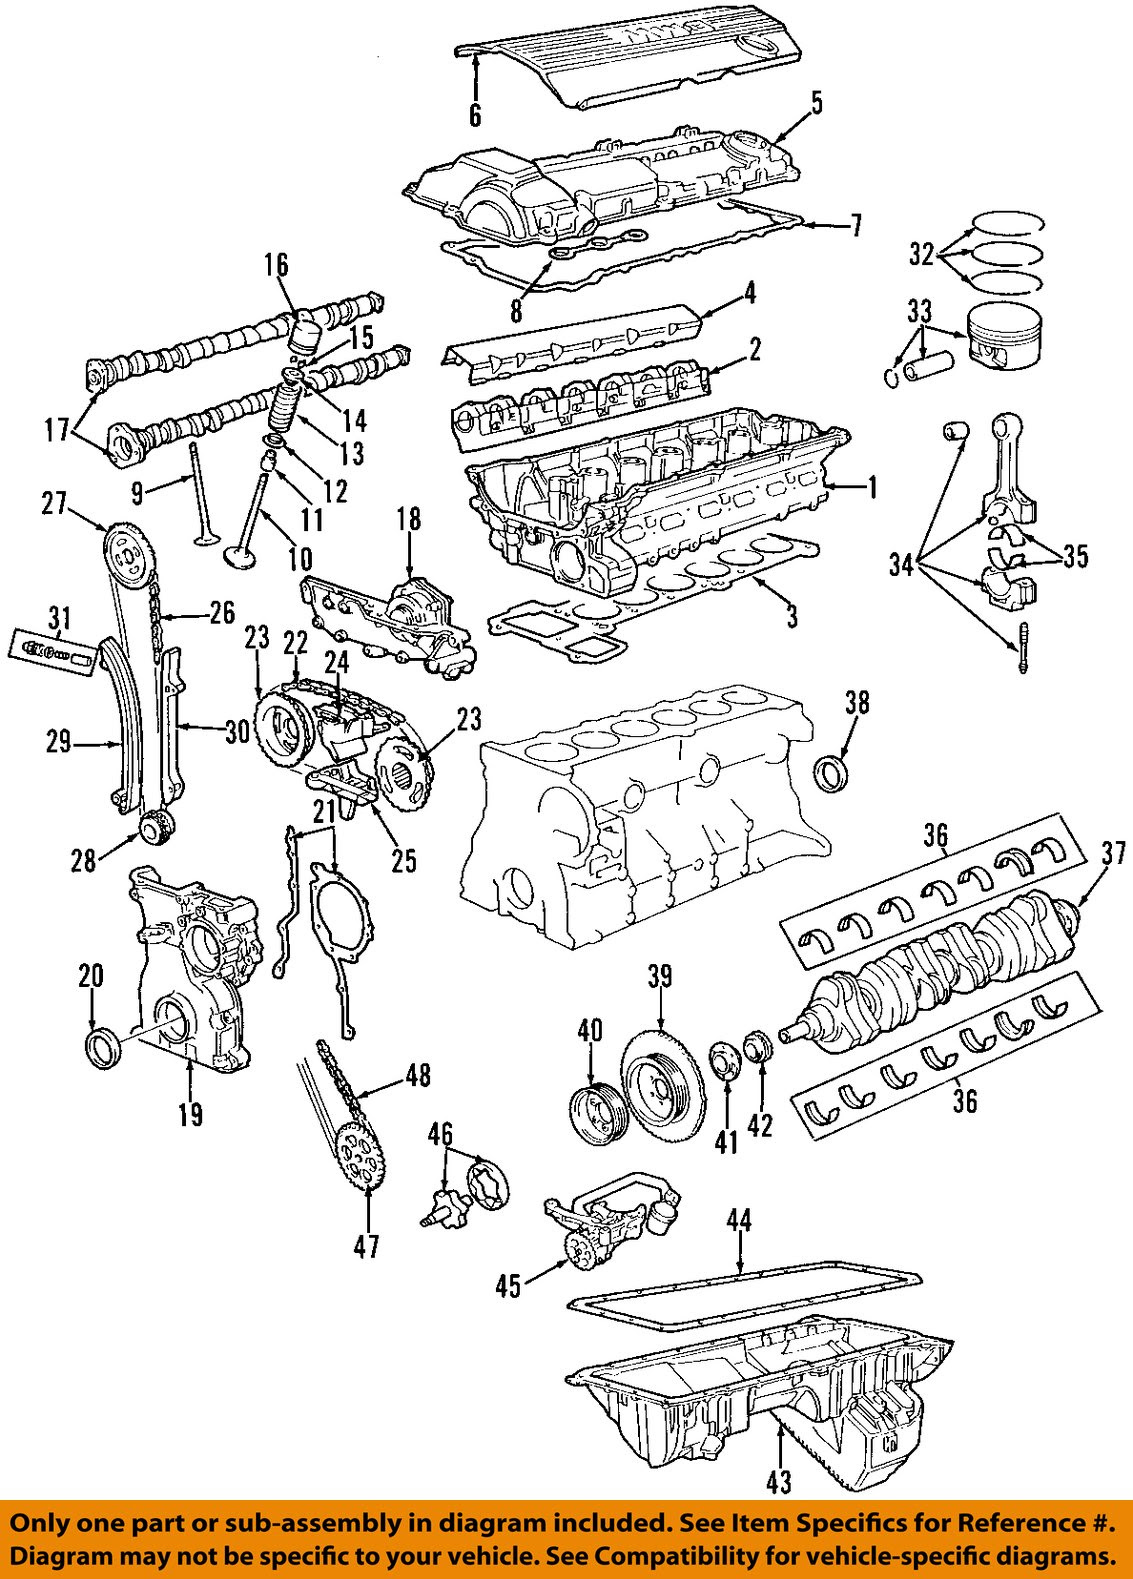 Bmw 330xi Engine Diagram Wiring Diagram Schema Calf Track A Calf Track A Atmosphereconcept It